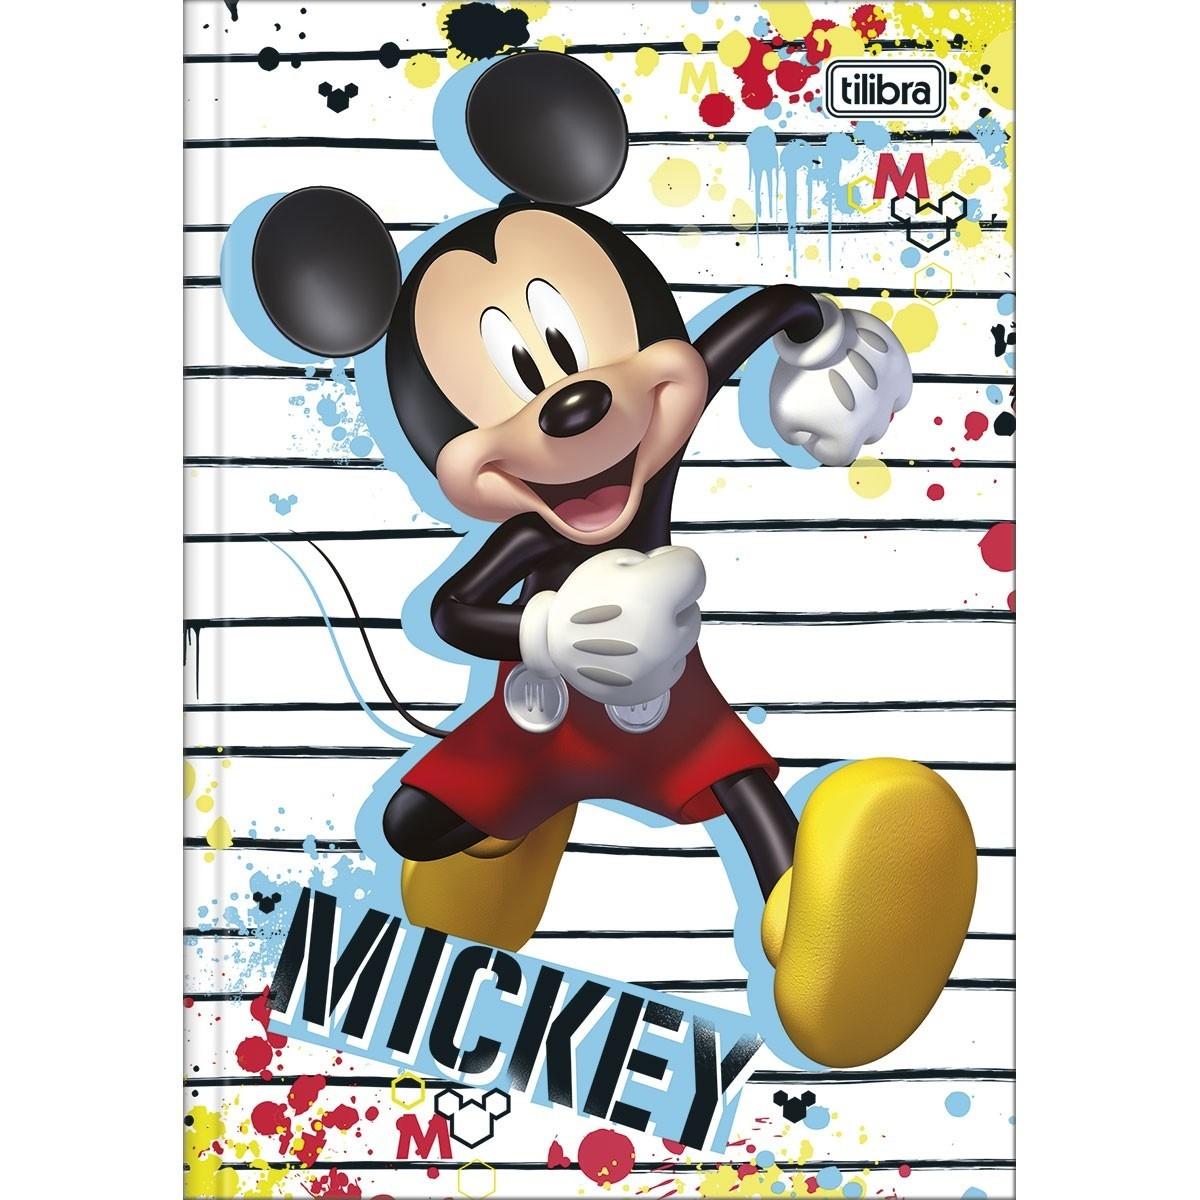 Caderno Brochura Capa Dura Mickey Mouse 80 Fls Tilibra